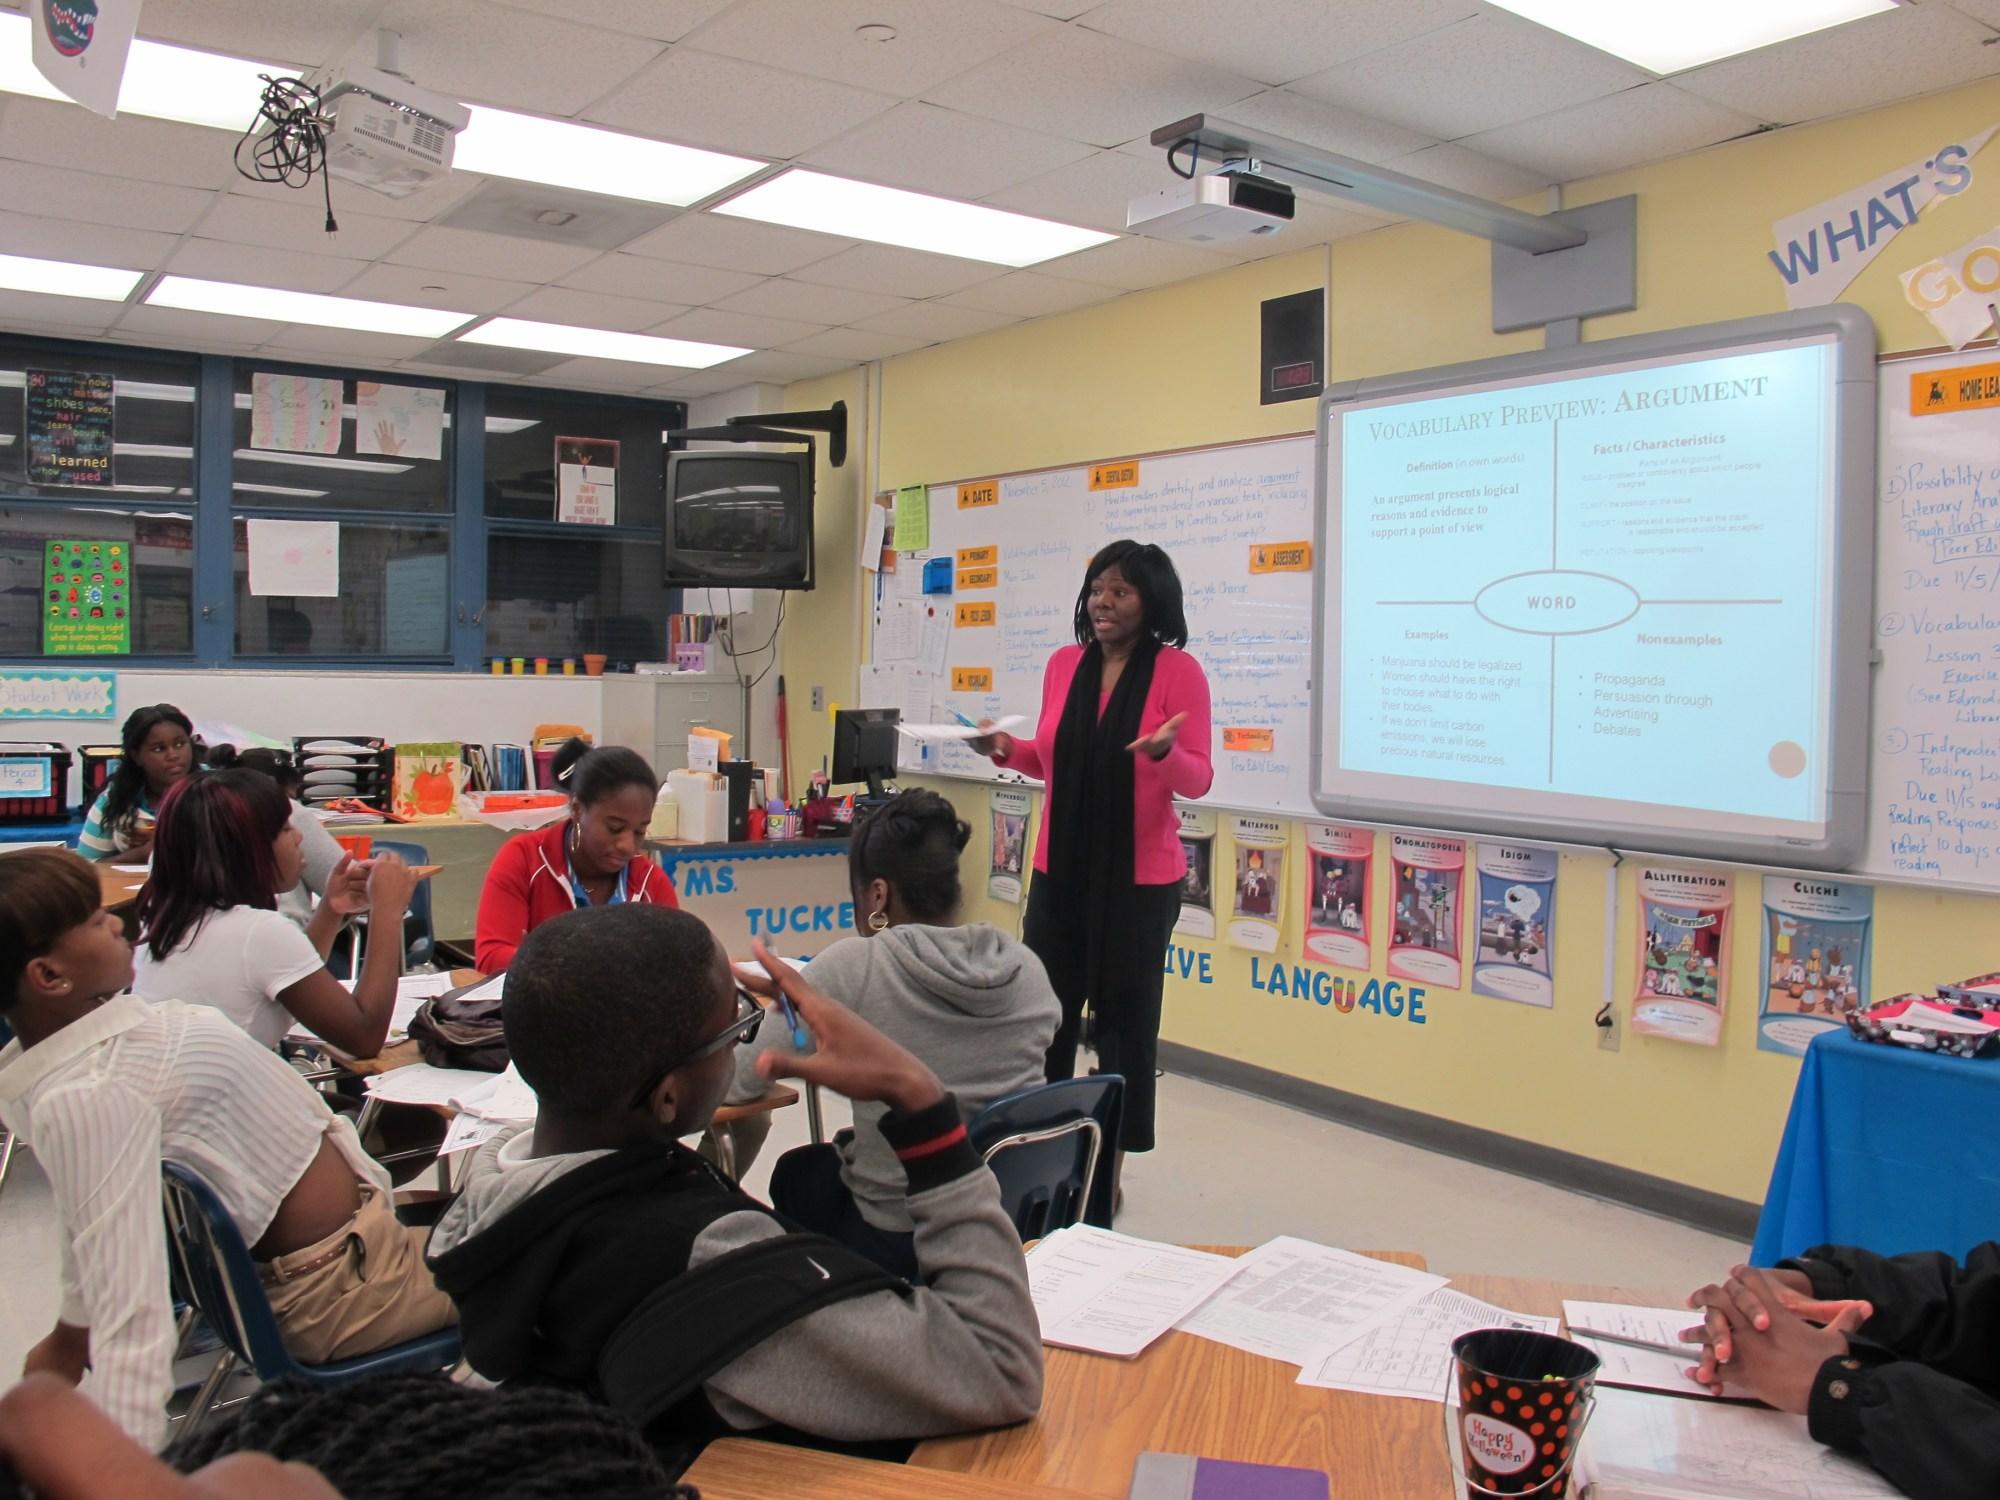 hight resolution of HS English teacher   StateImpact Florida